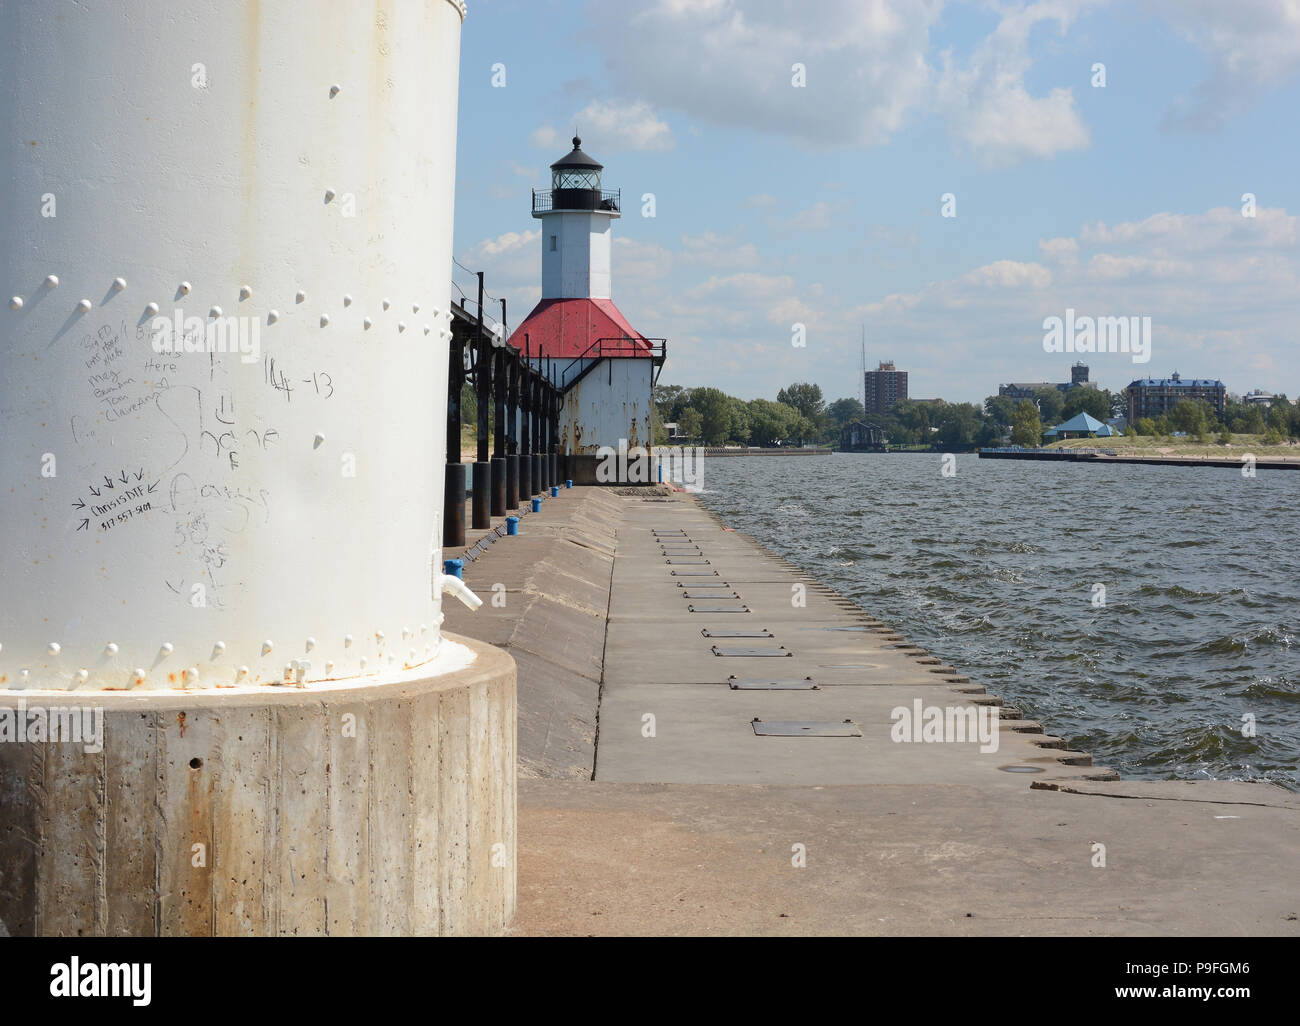 The St  Joseph North Pier Lighthouse in St  Joseph, Michigan